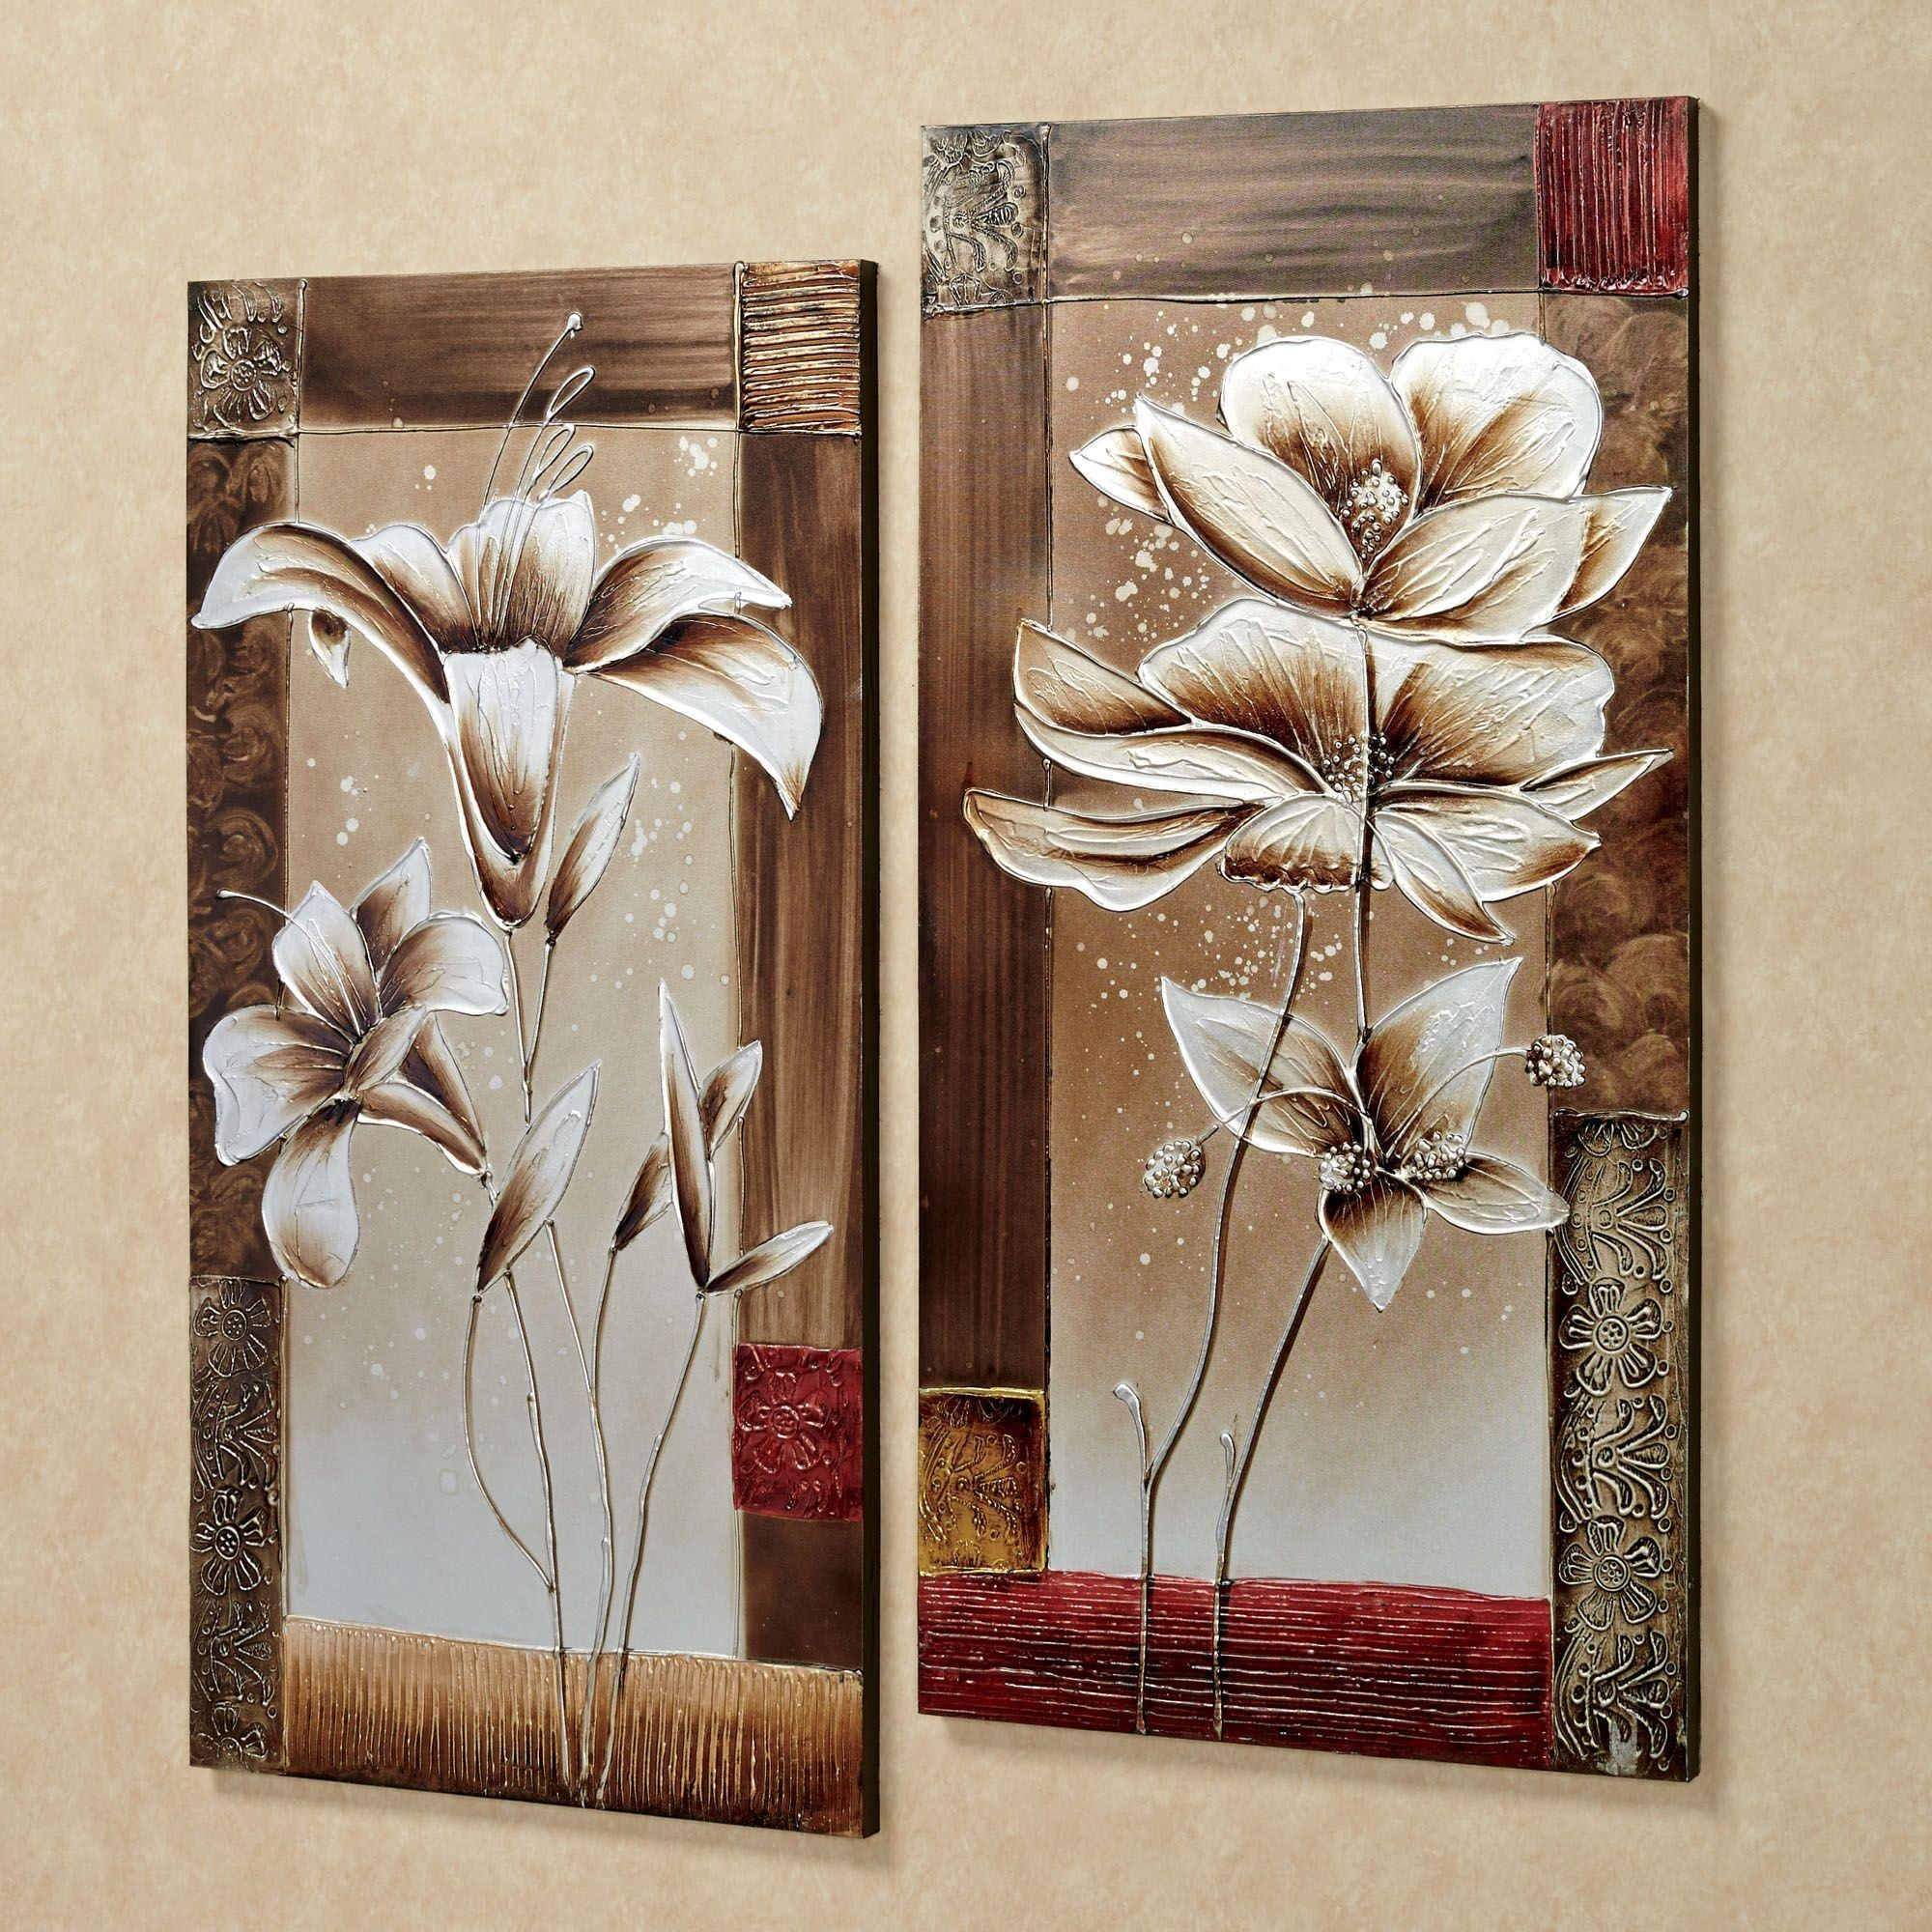 Wall Art: Stunning Canvas Art Sets 2 Piece Canvas Wall Art, Canvas With Regard To Cheap Wall Art Canvas Sets (Image 20 of 20)